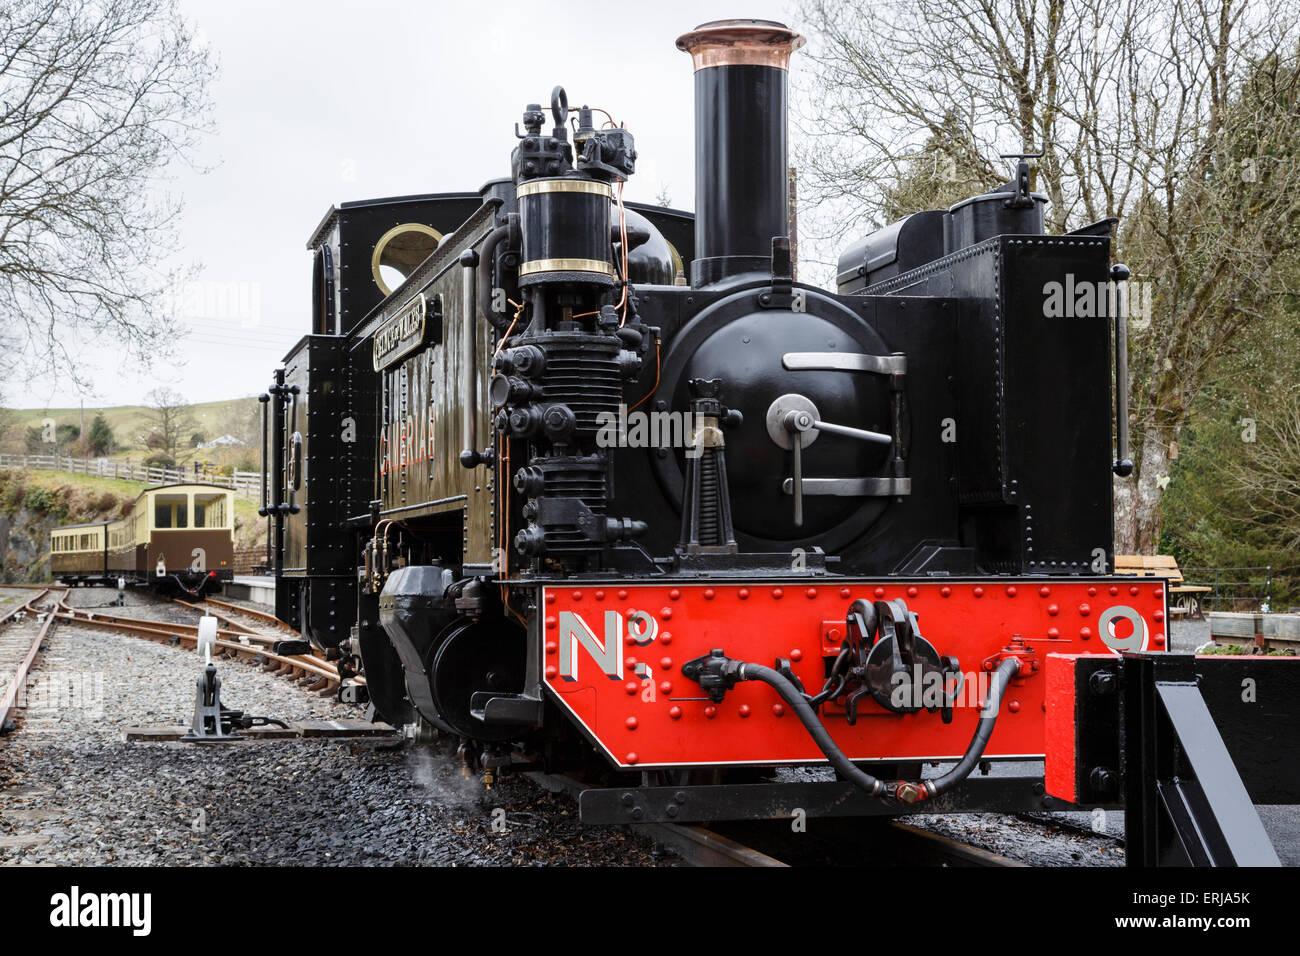 Steam engine Prince of Wales at Devil's Bridge Station, Vale of Rheidol Railway, Ceredigion, Wales - Stock Image